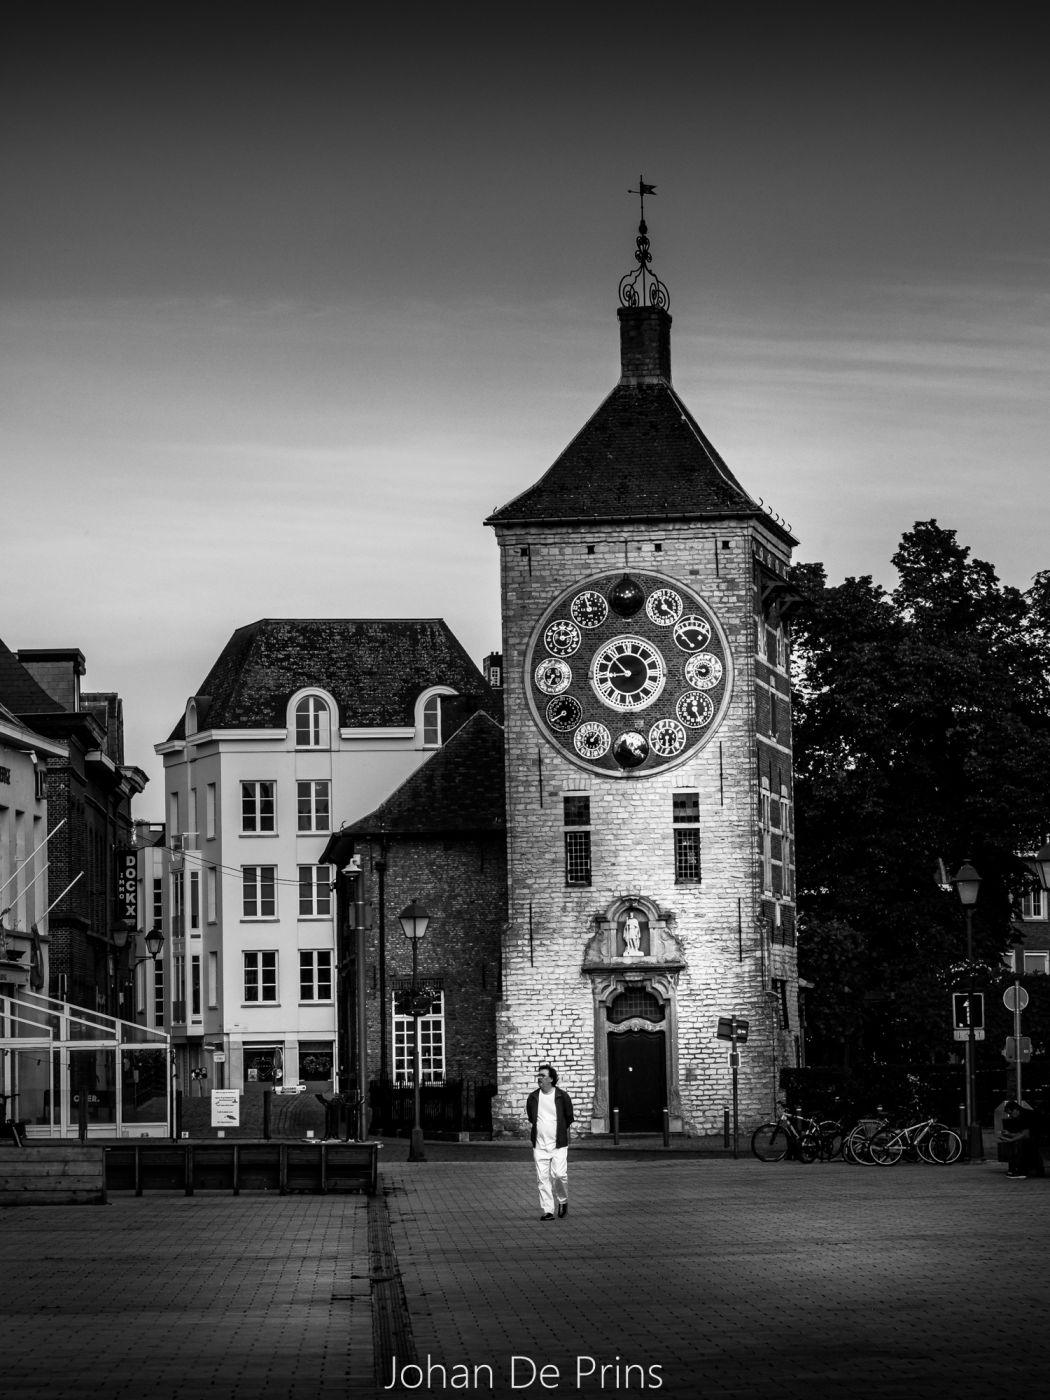 Zimmer Tower, Belgium